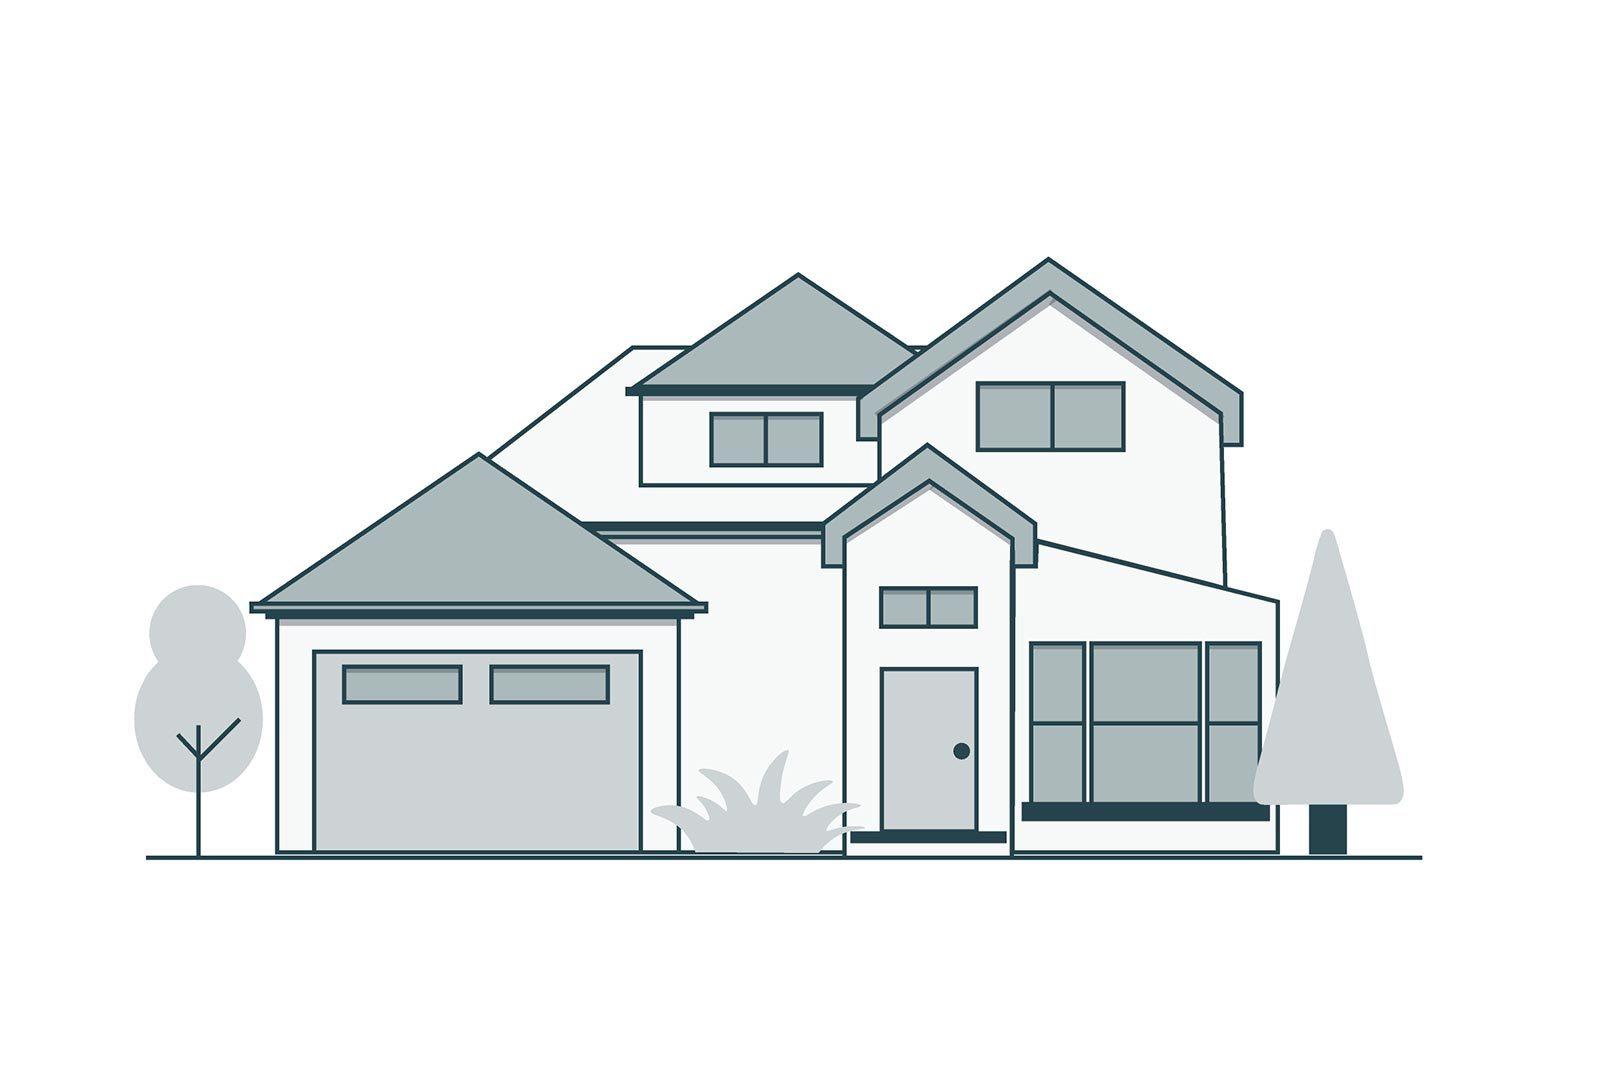 2247 22nd Ave Sacramento, CA 95822